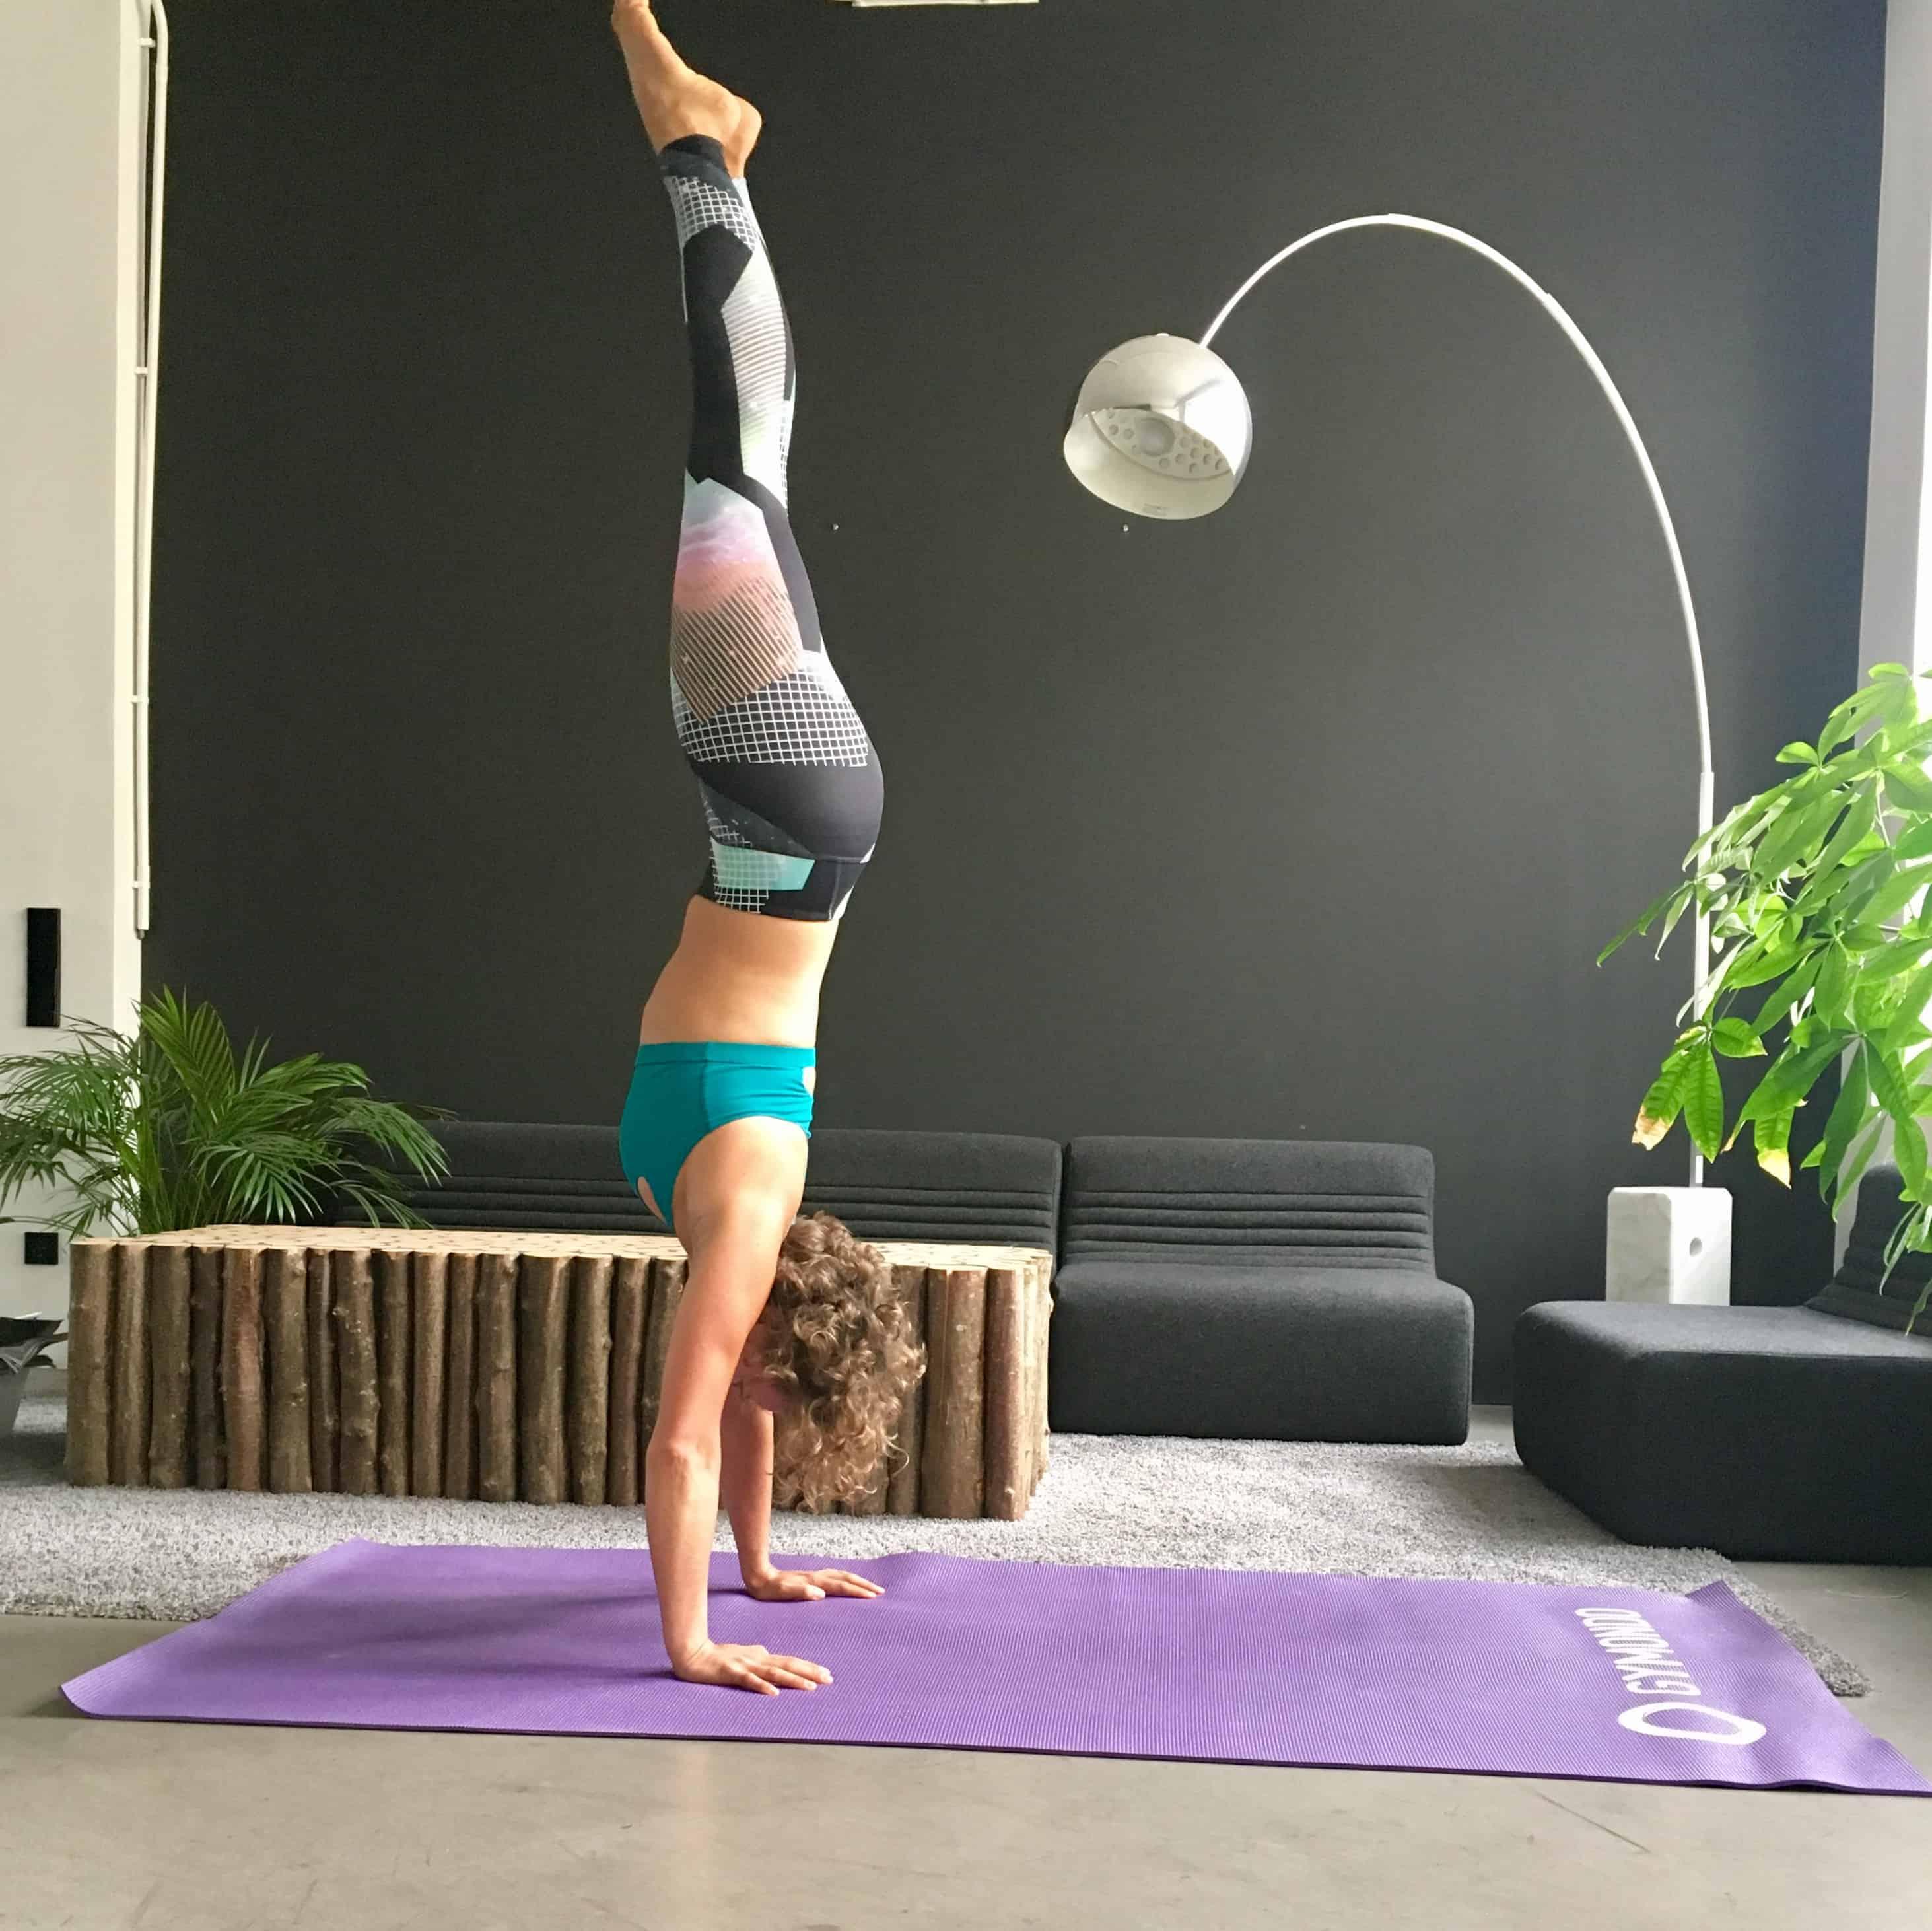 Frau macht Handstand auf lila trainingsmatte